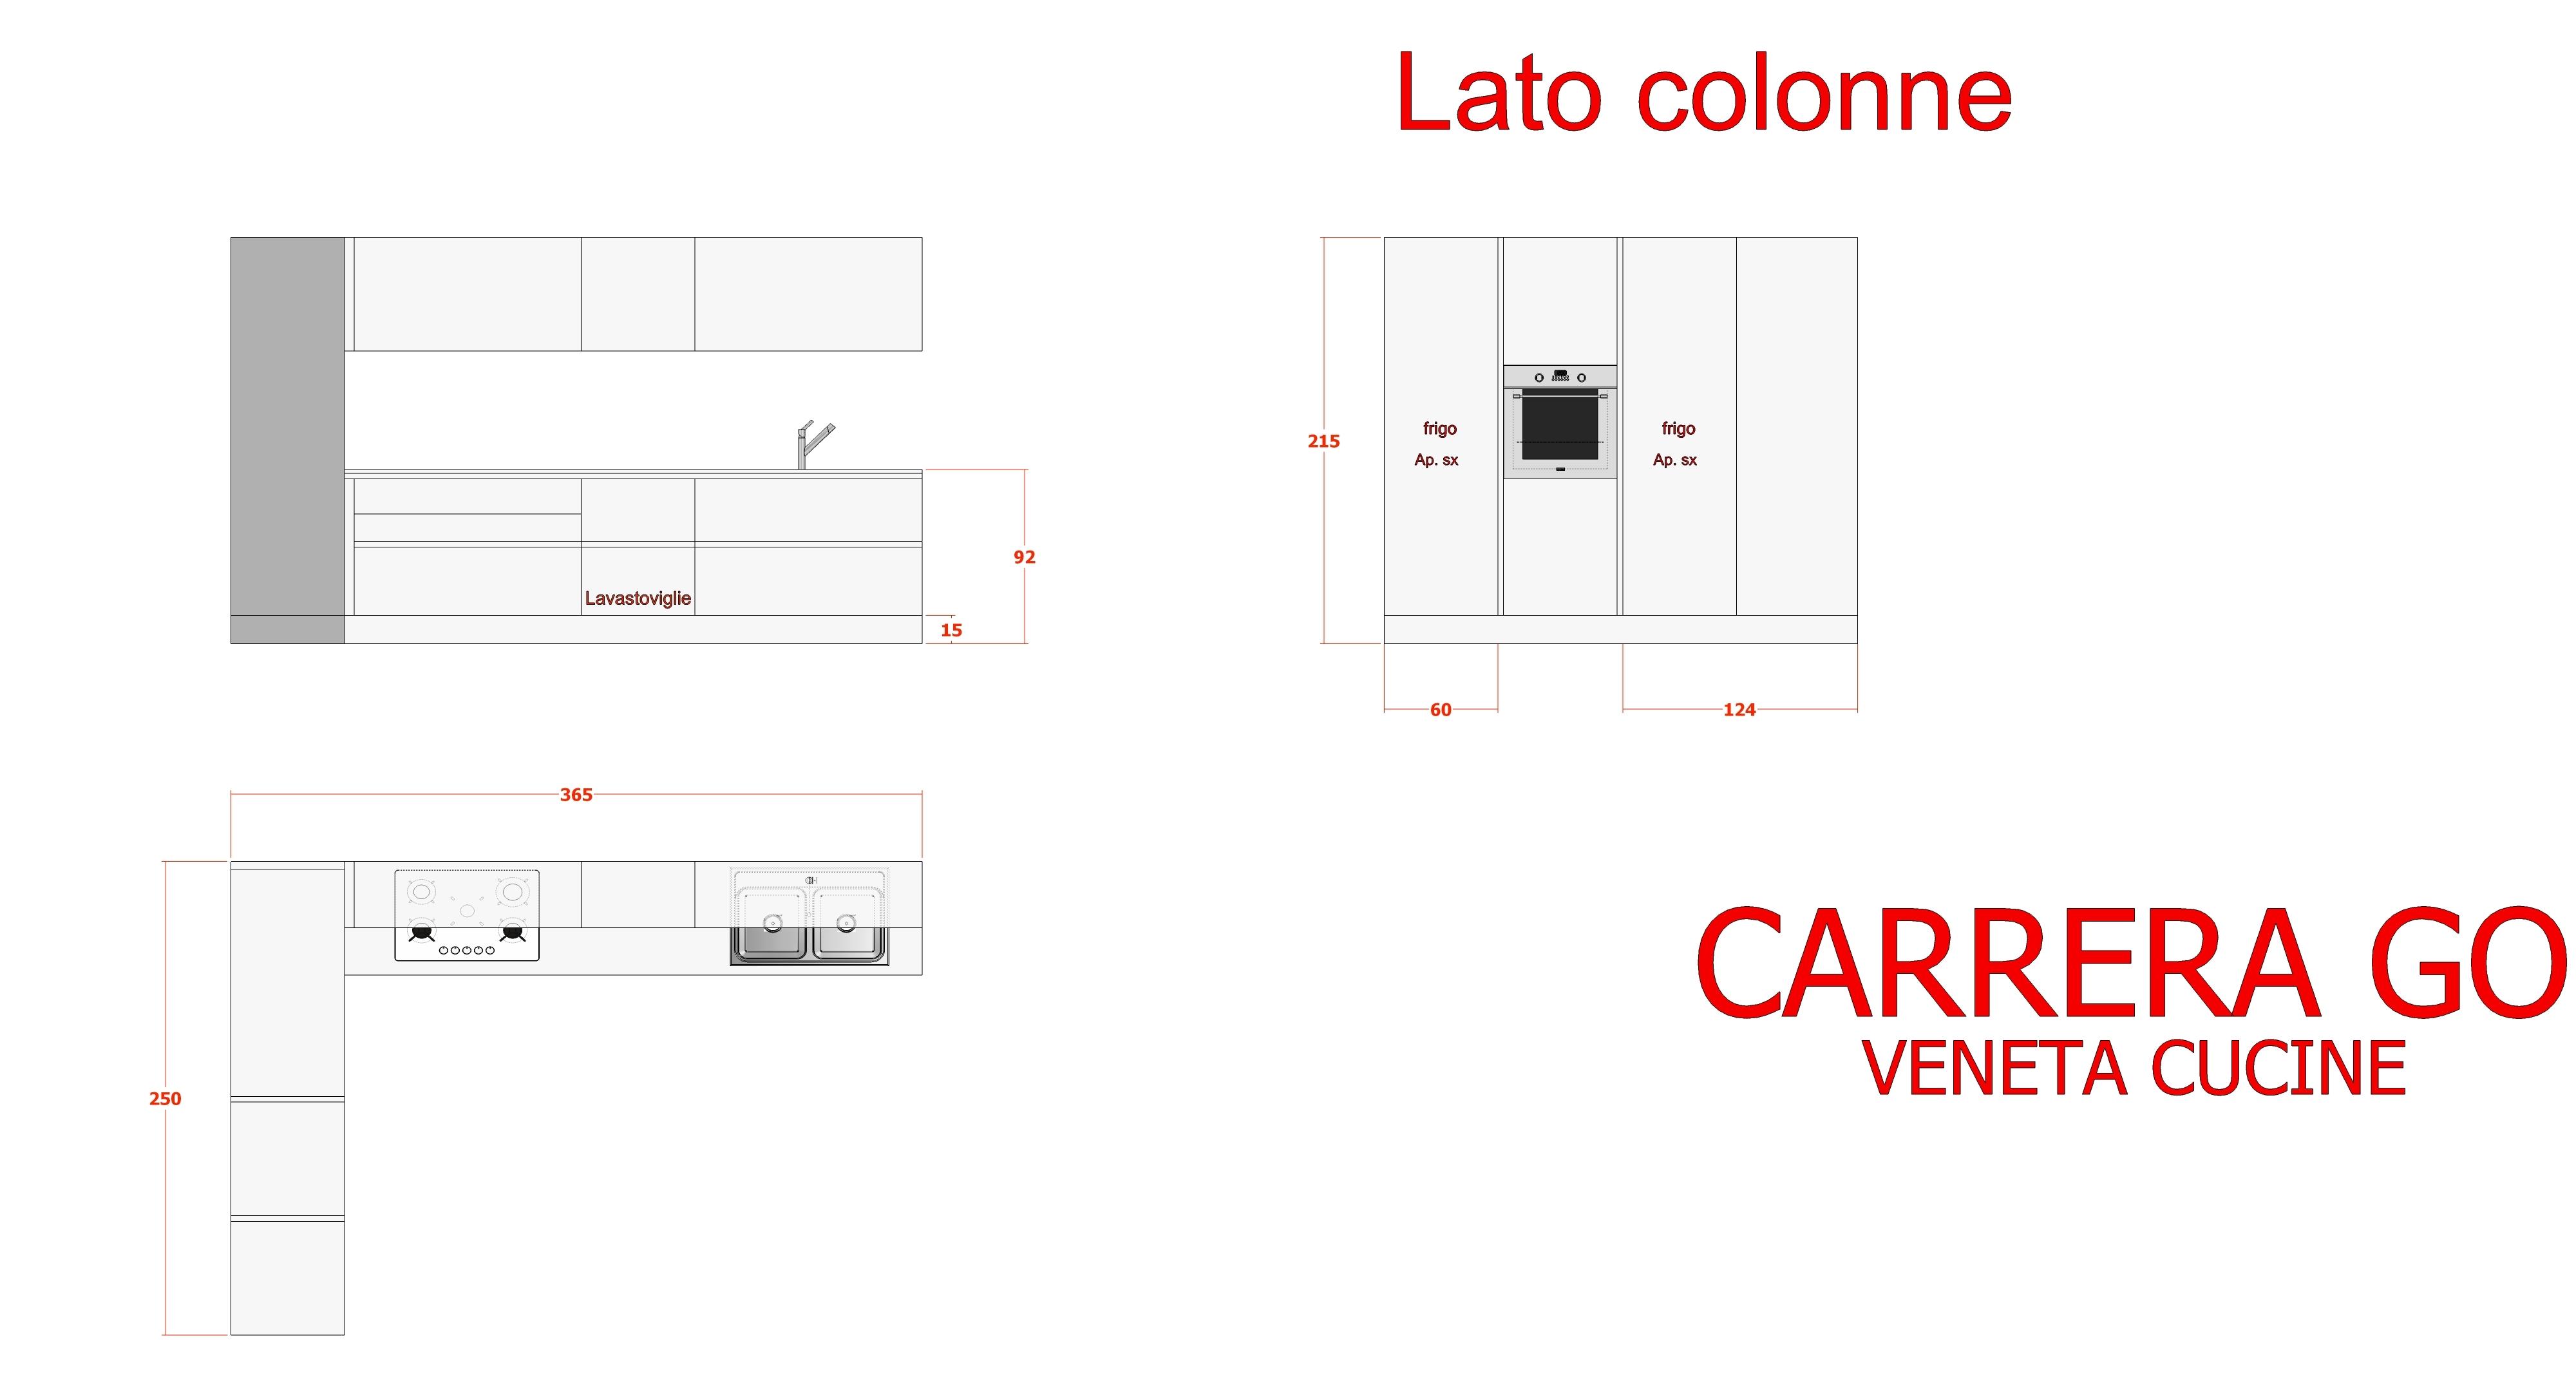 Cucina Veneta Cucine Carrera Go Moderna Laminato Materico Cucine A  #B51616 4000 2166 Veneta Cucine O Cesar